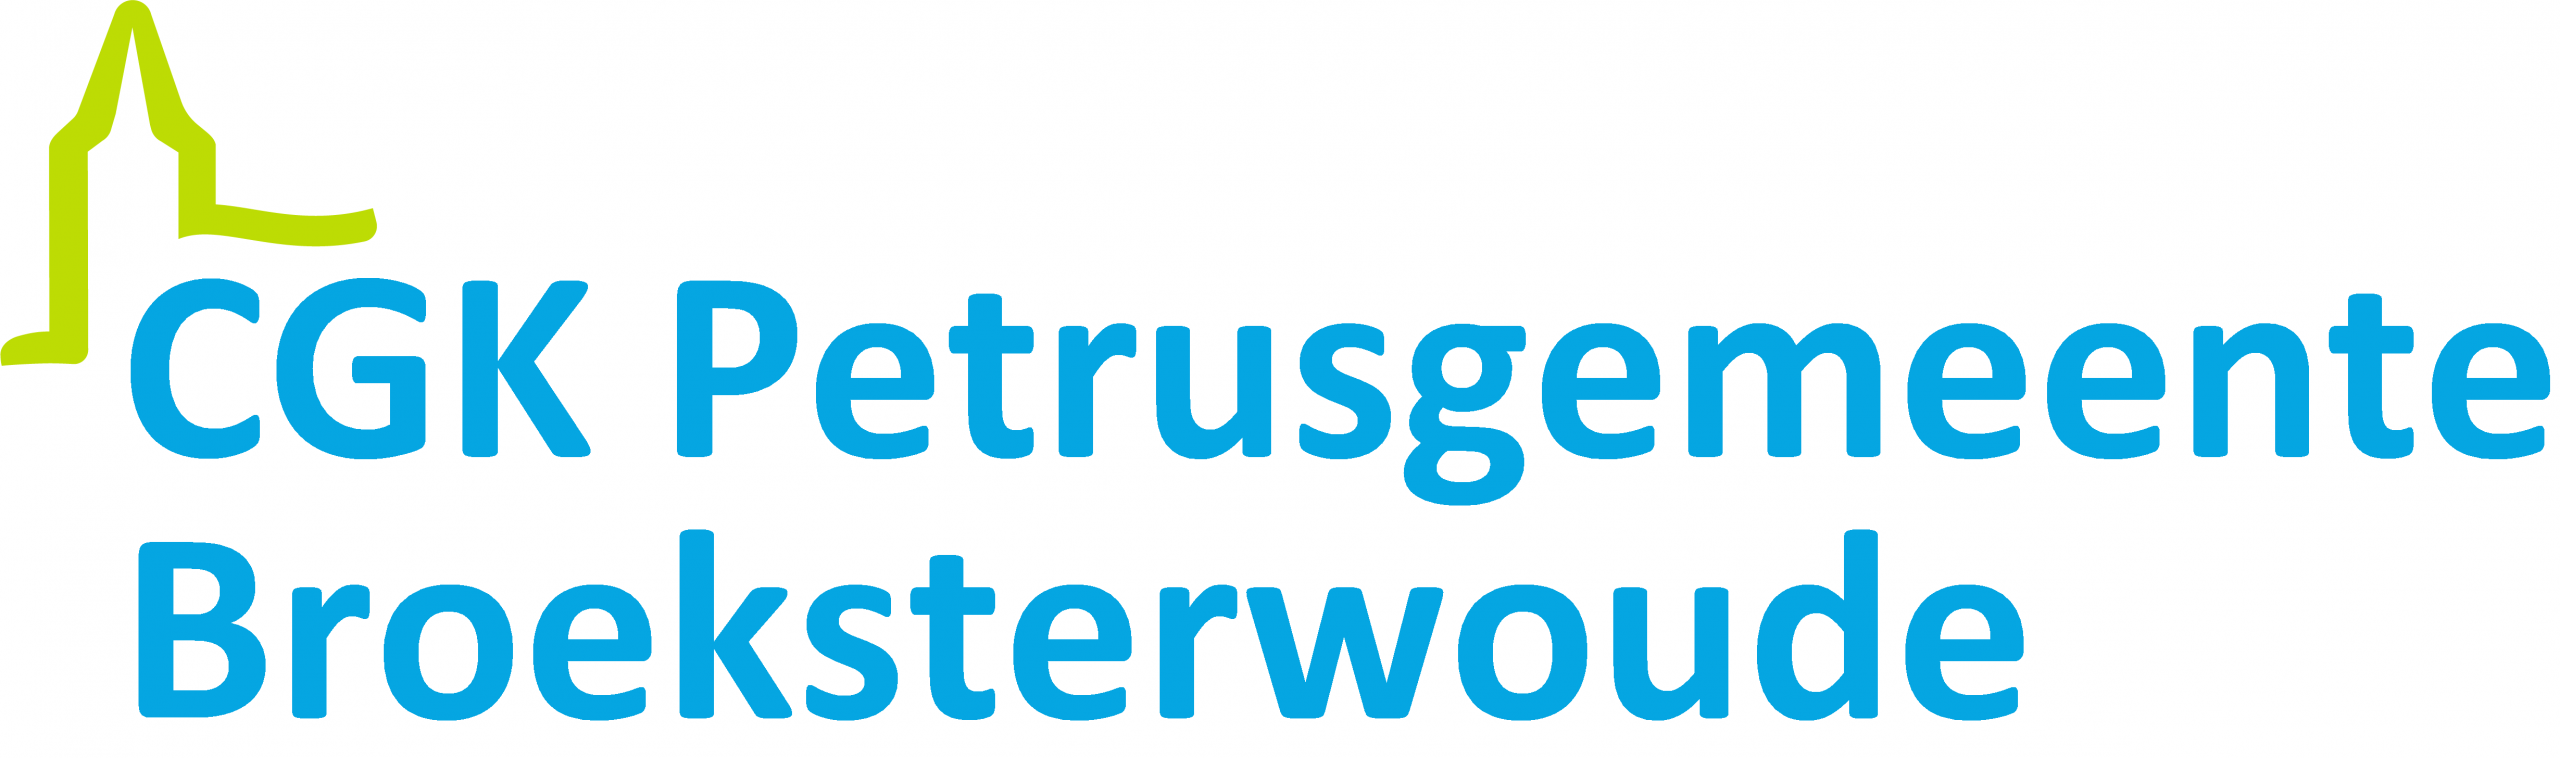 Website CGK Petrusgemeente Broeksterwald